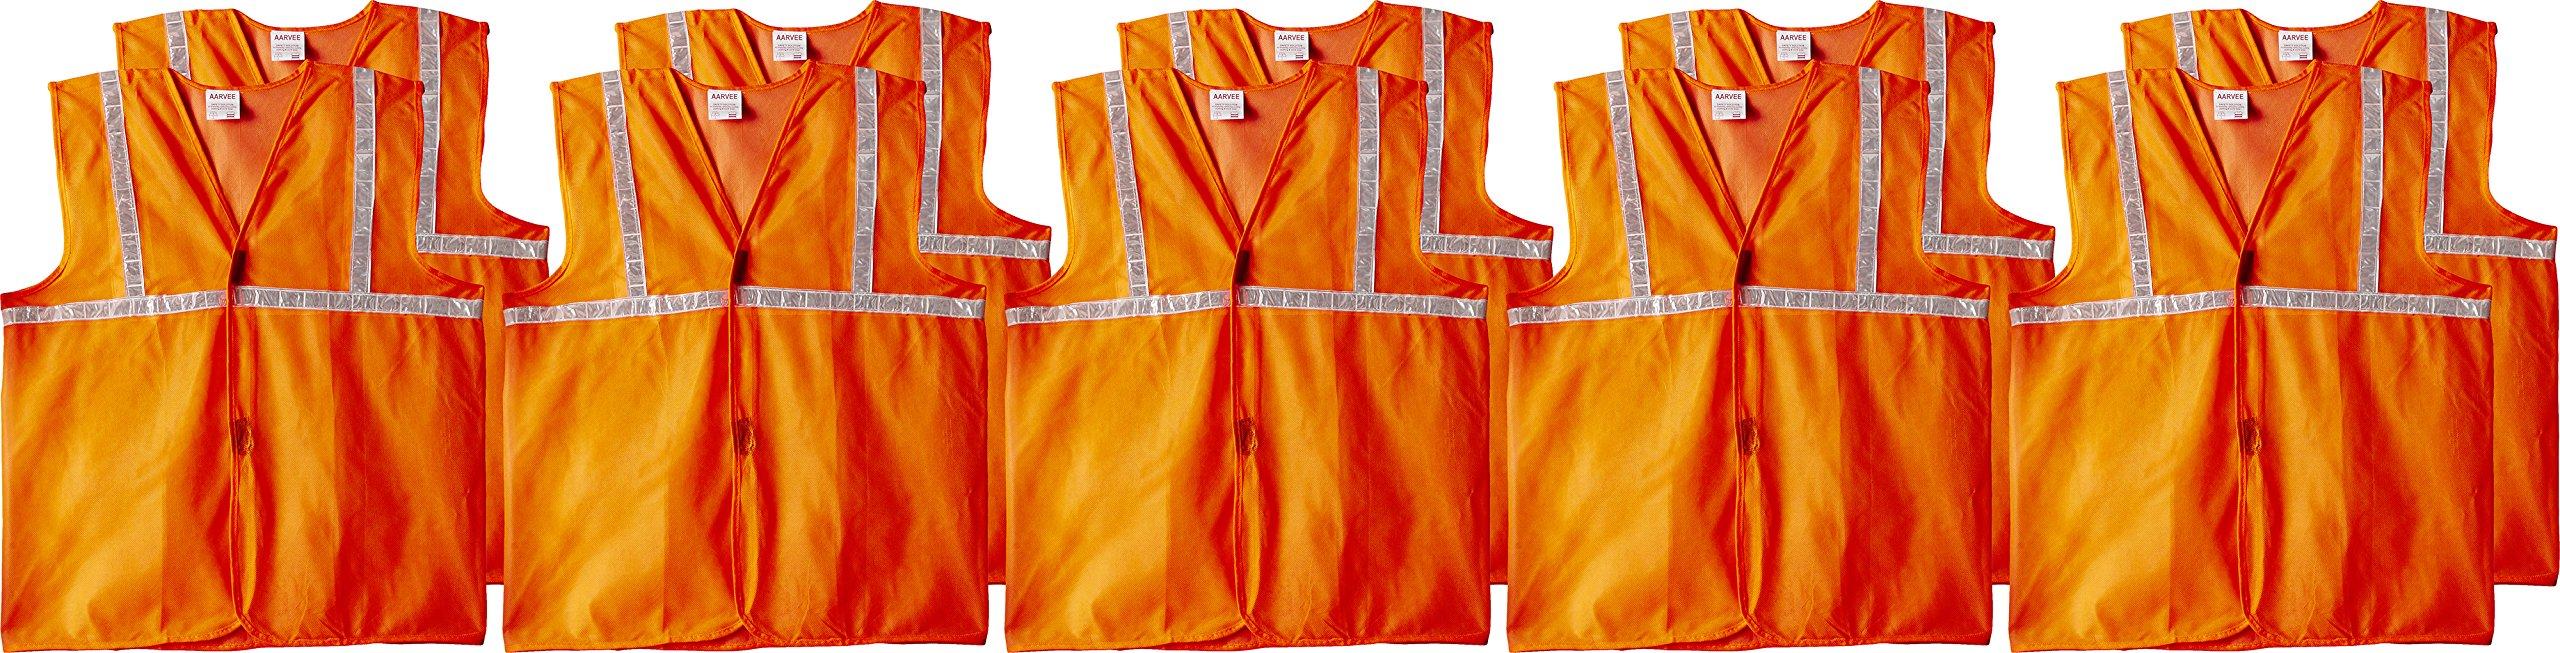 "Aarvee Safety Jacket Cloth 50 gsm 1"" Reflective Tape - Orange (Pack of 10)"